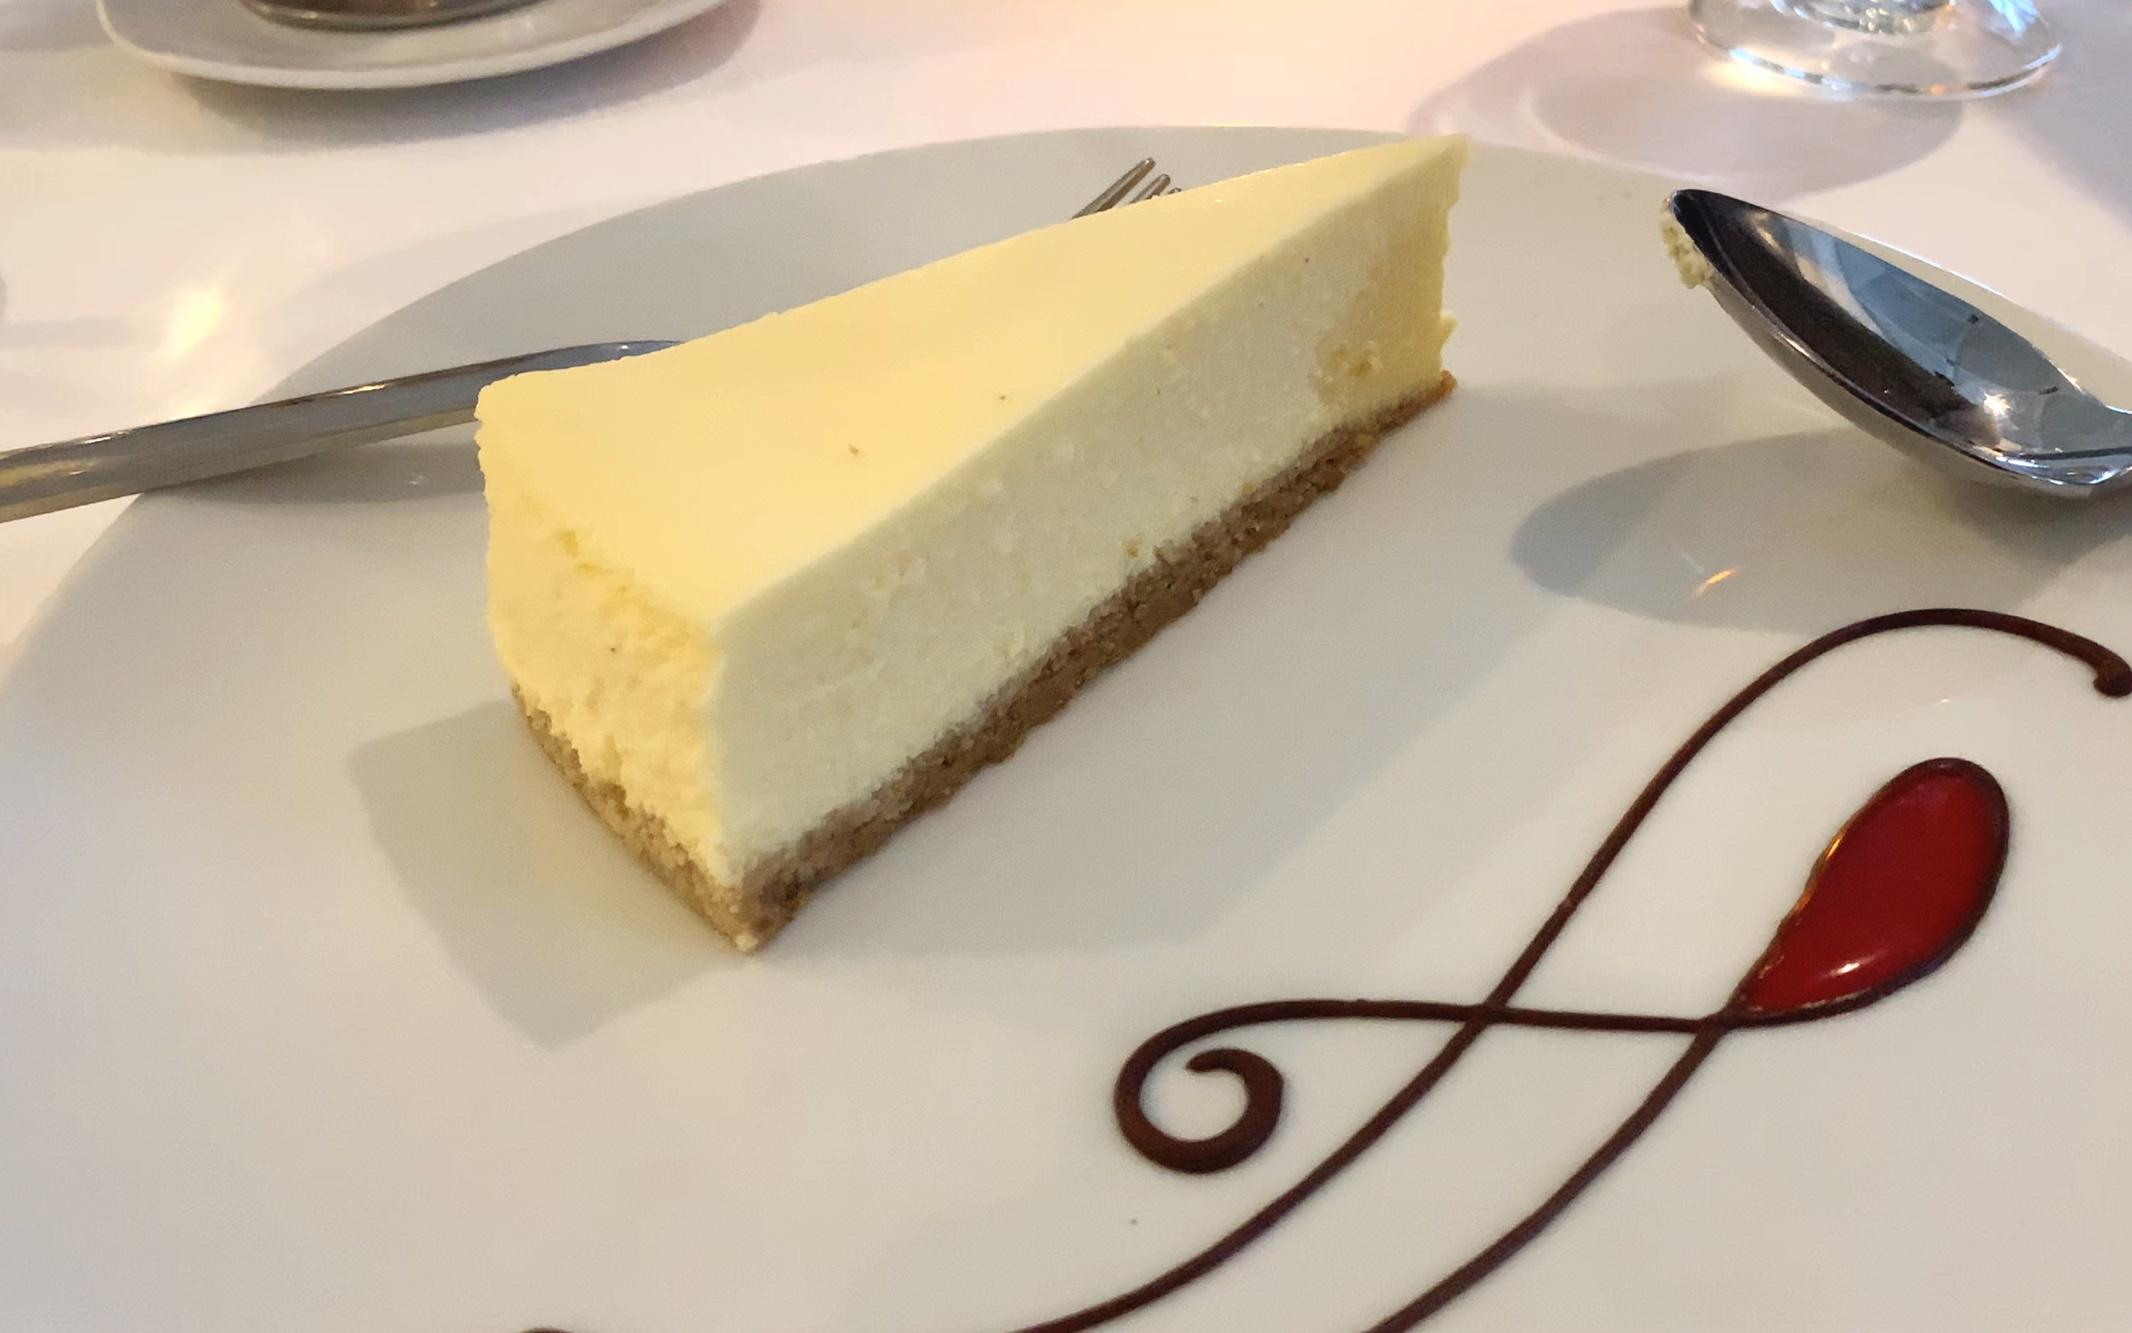 New York cheesecake from the classics menu.